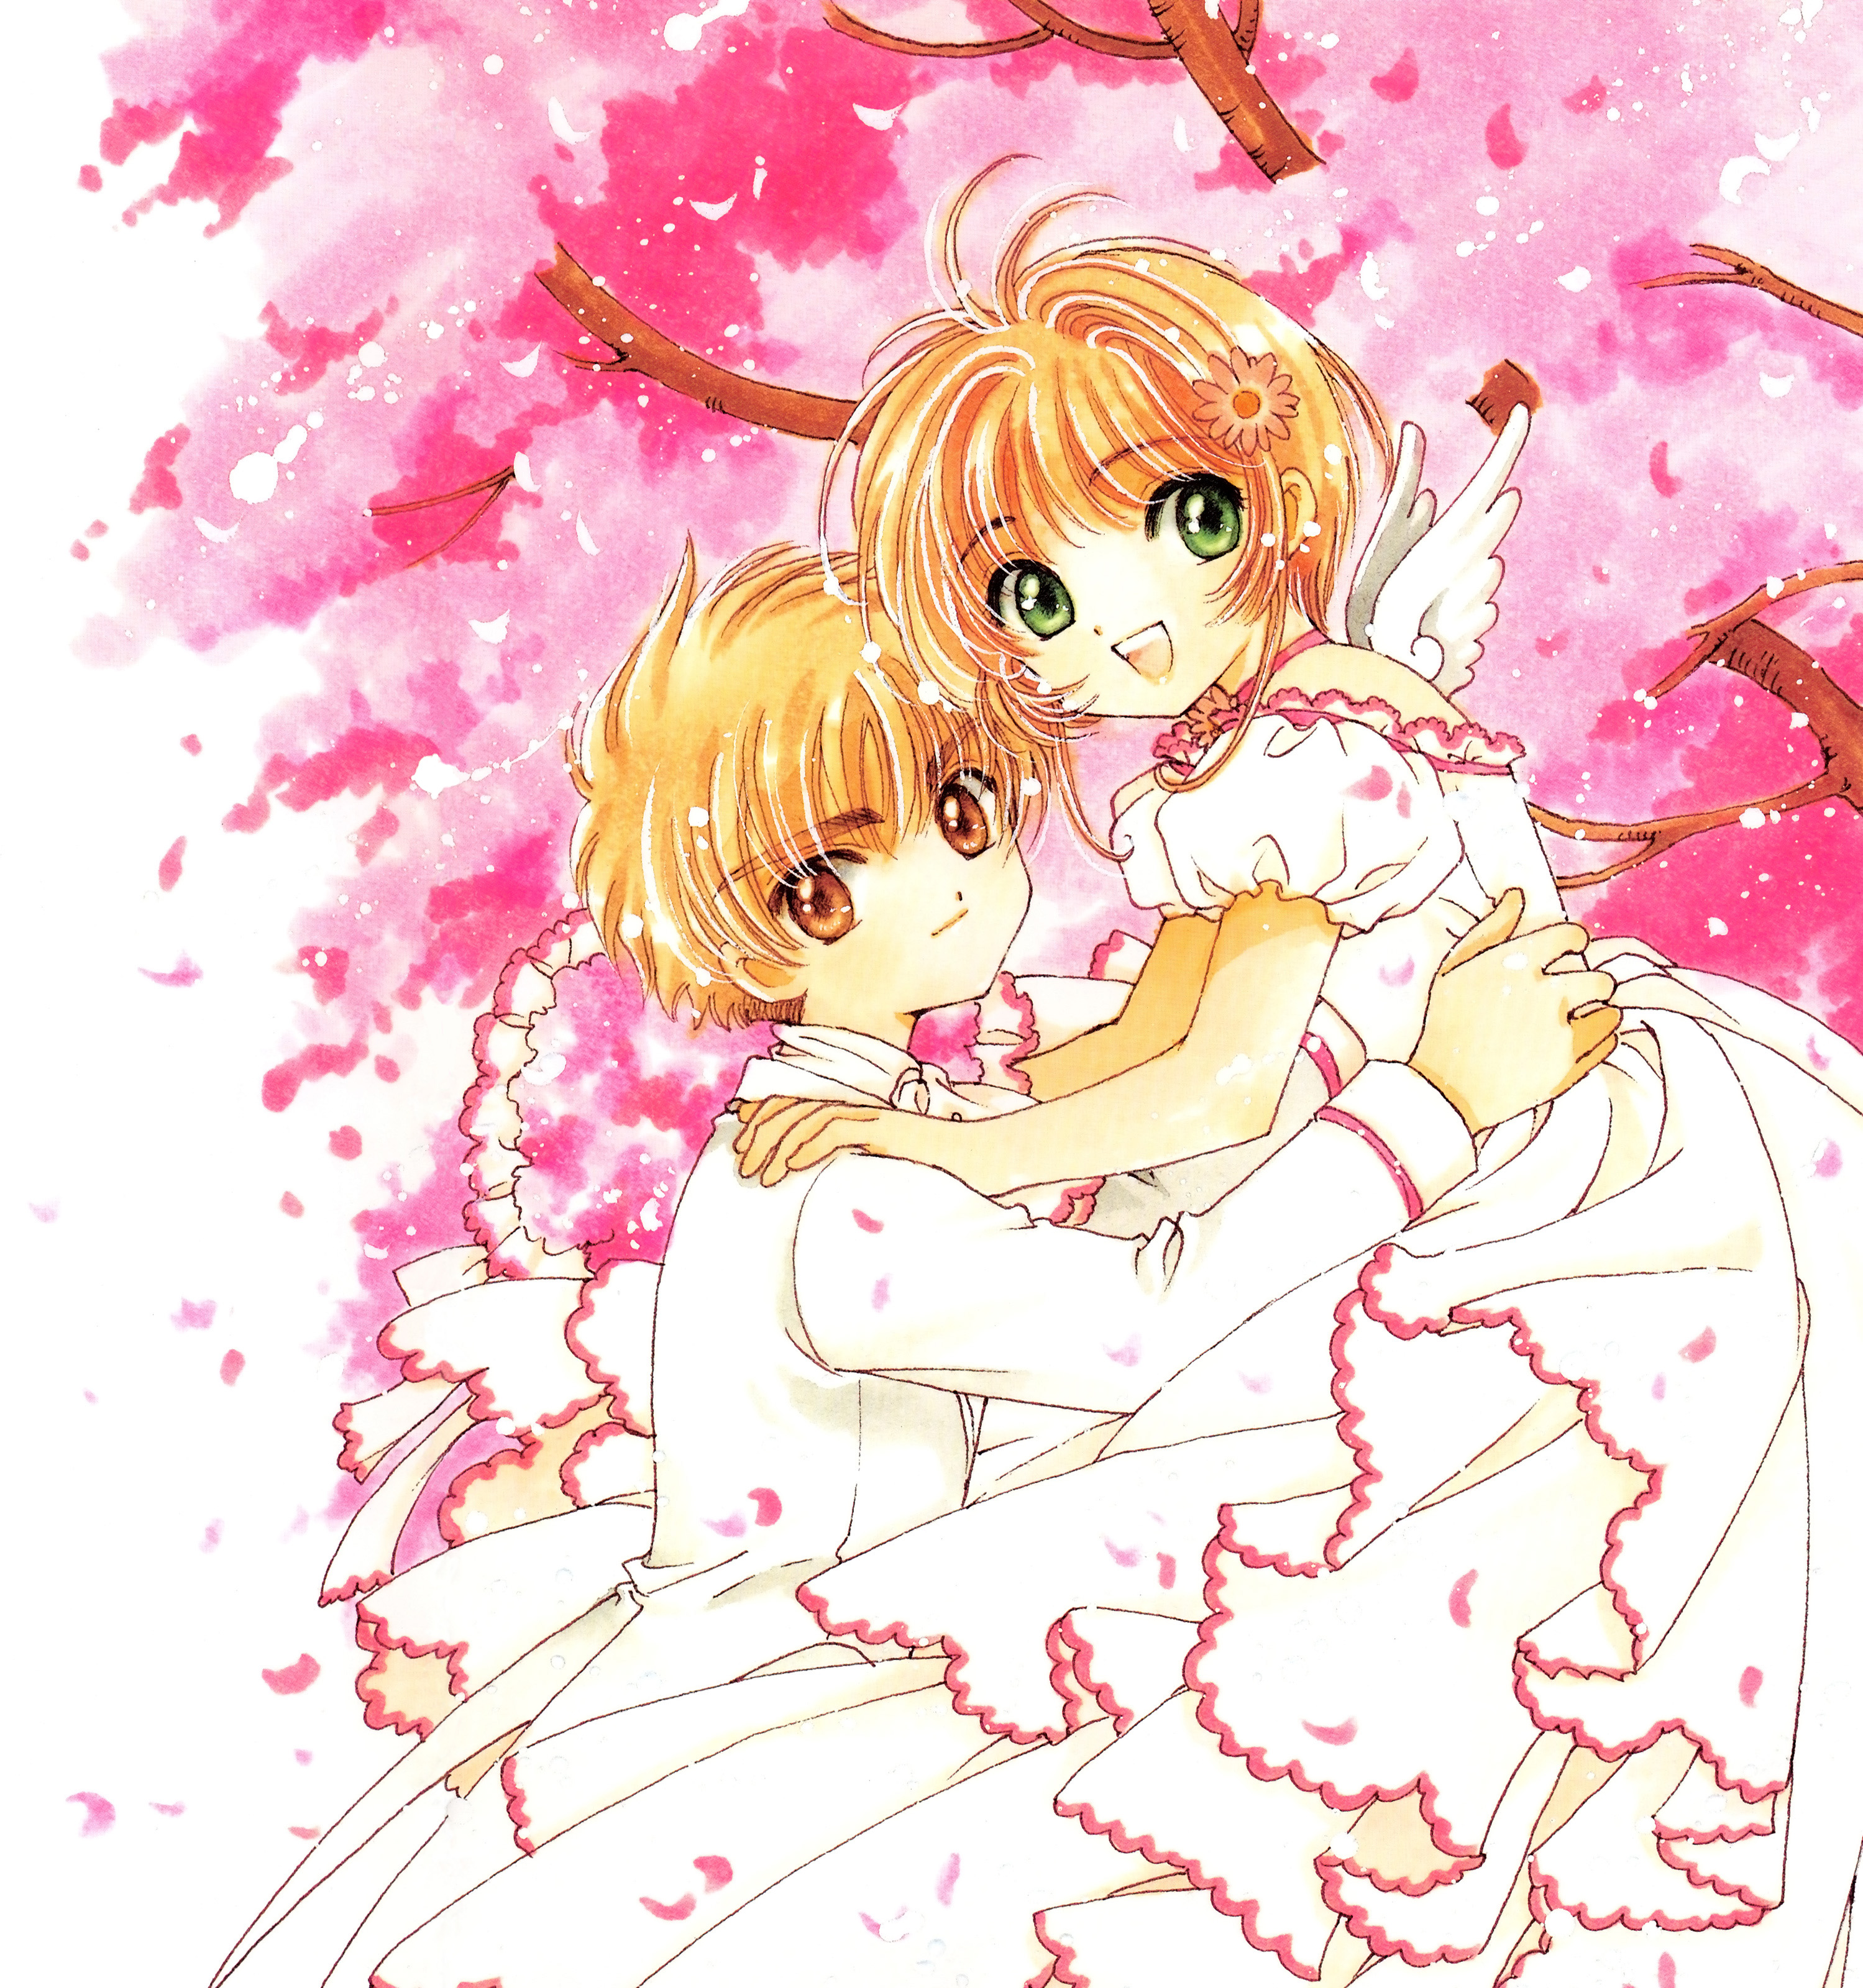 Les artbooks de Card Captor Sakura Cardcaptor.Sakura.full.1102905